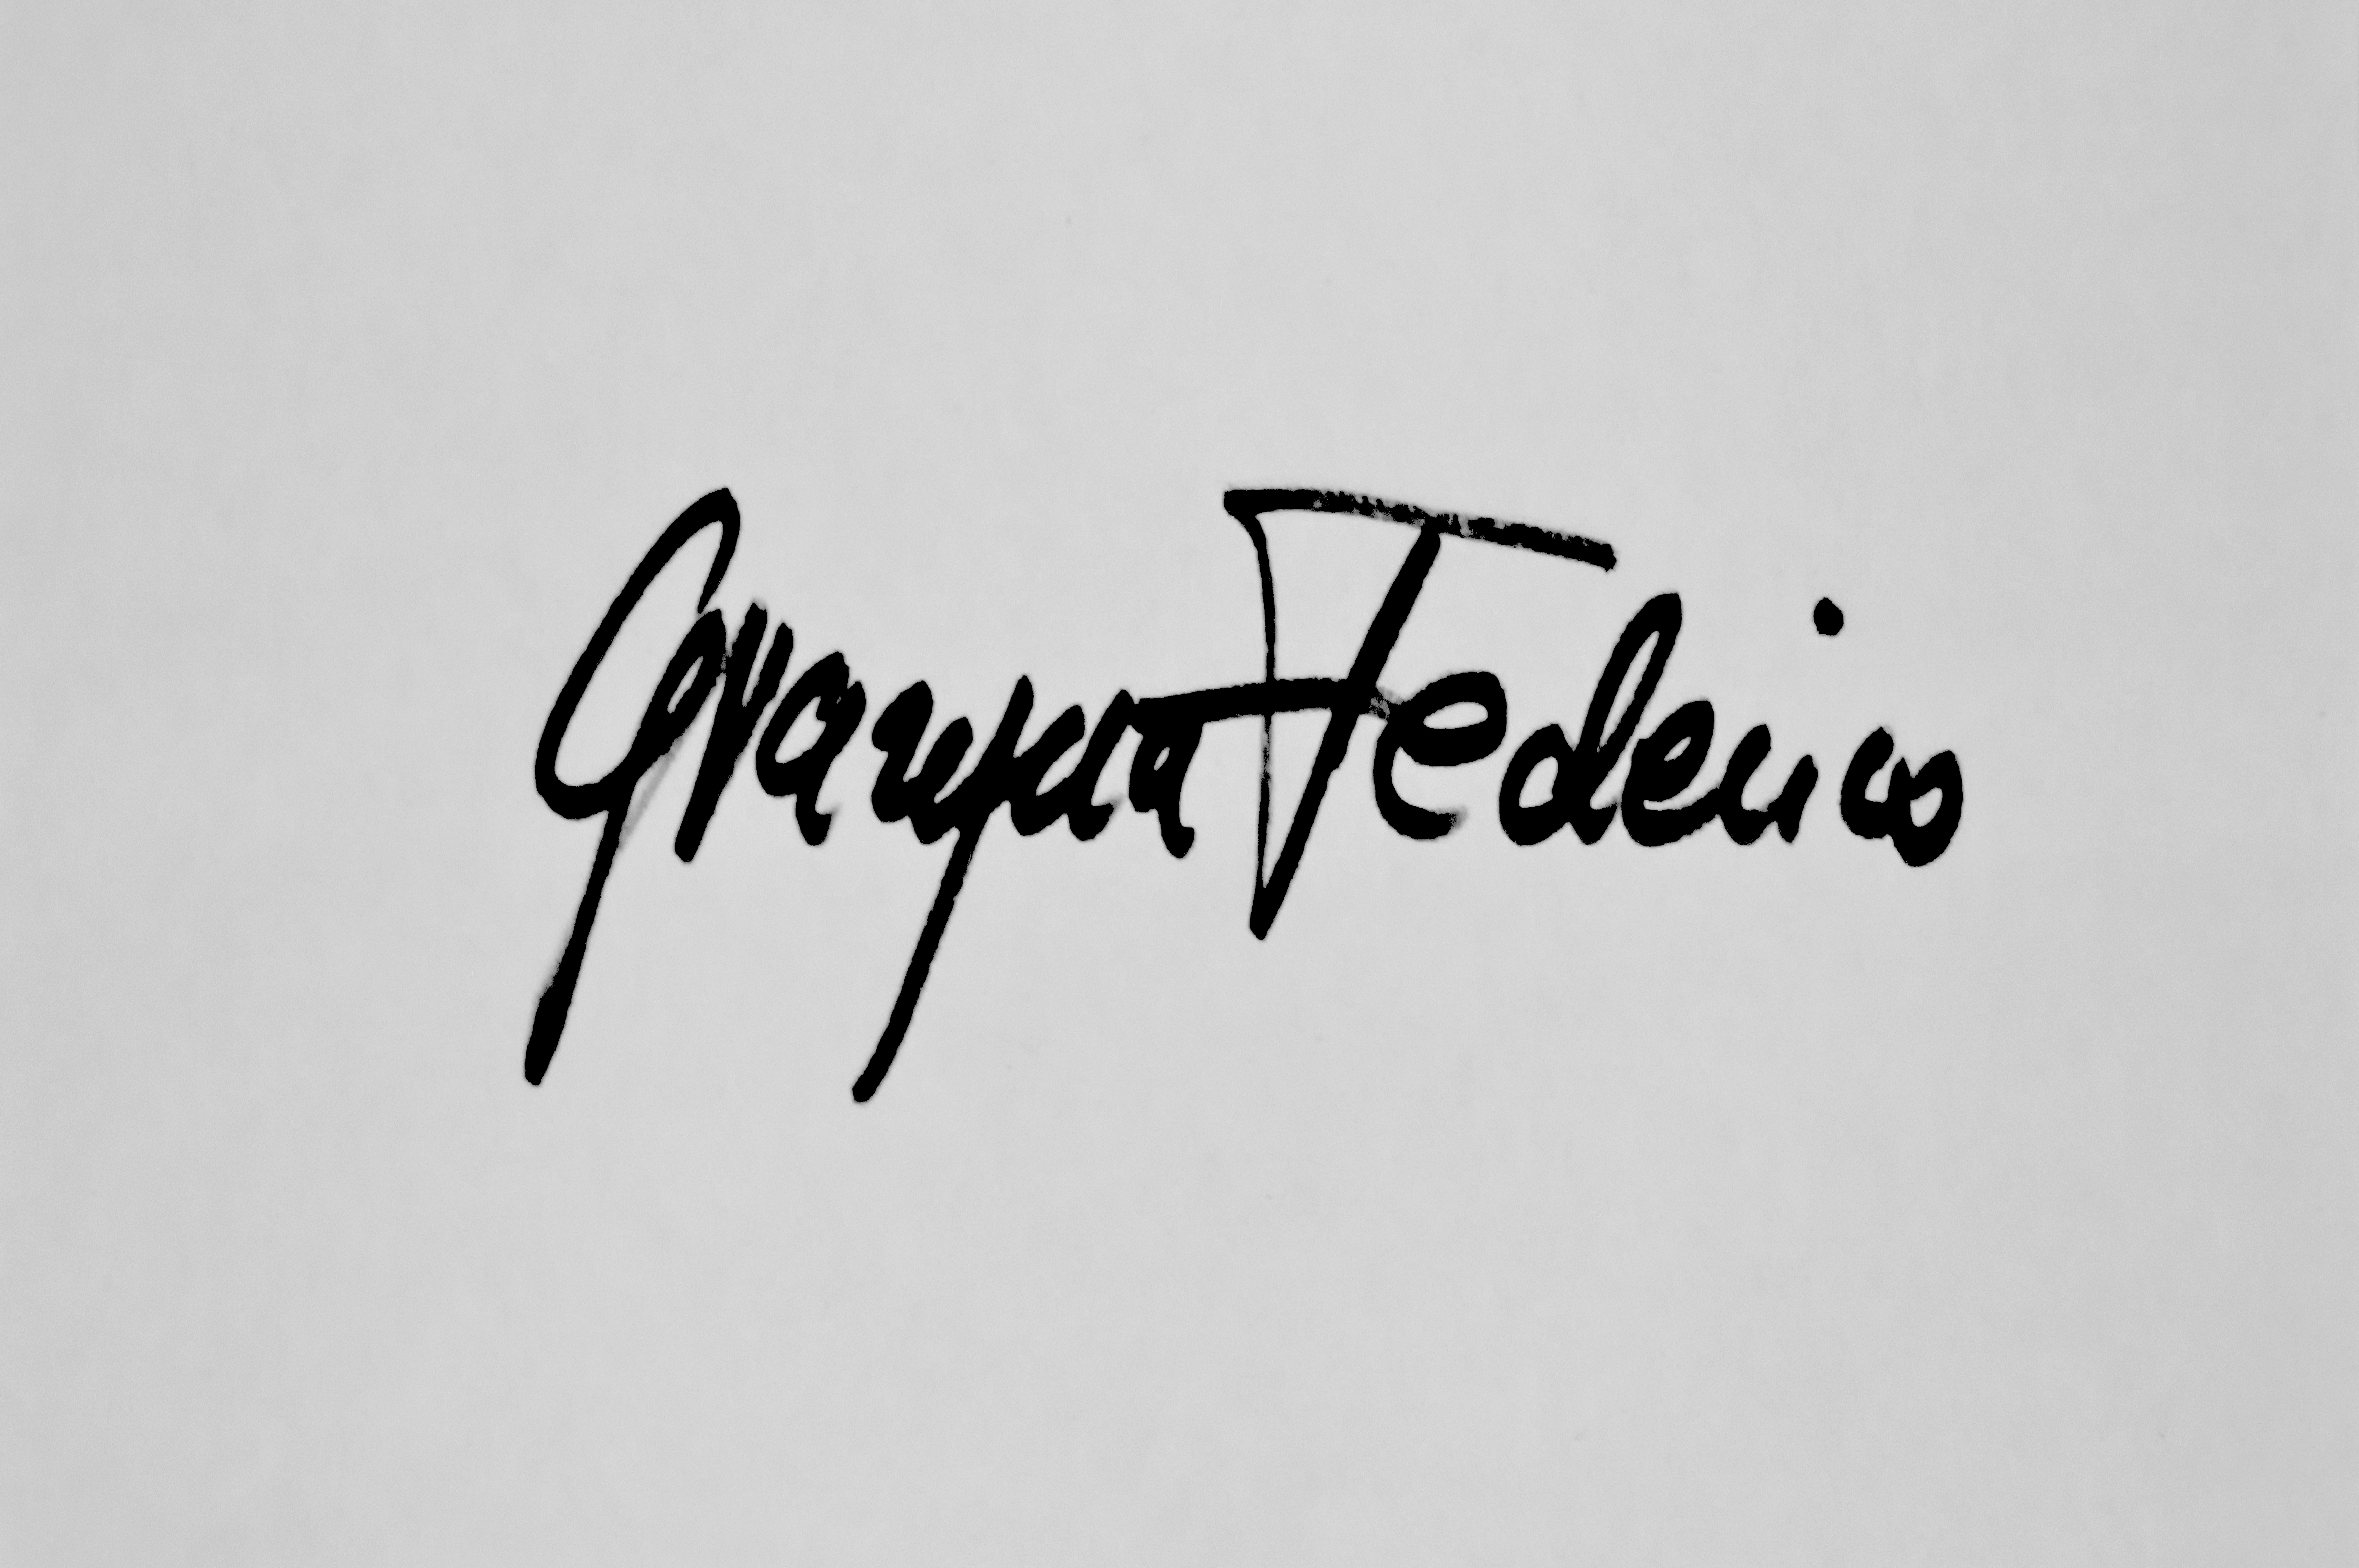 Arte-Federico's Signature